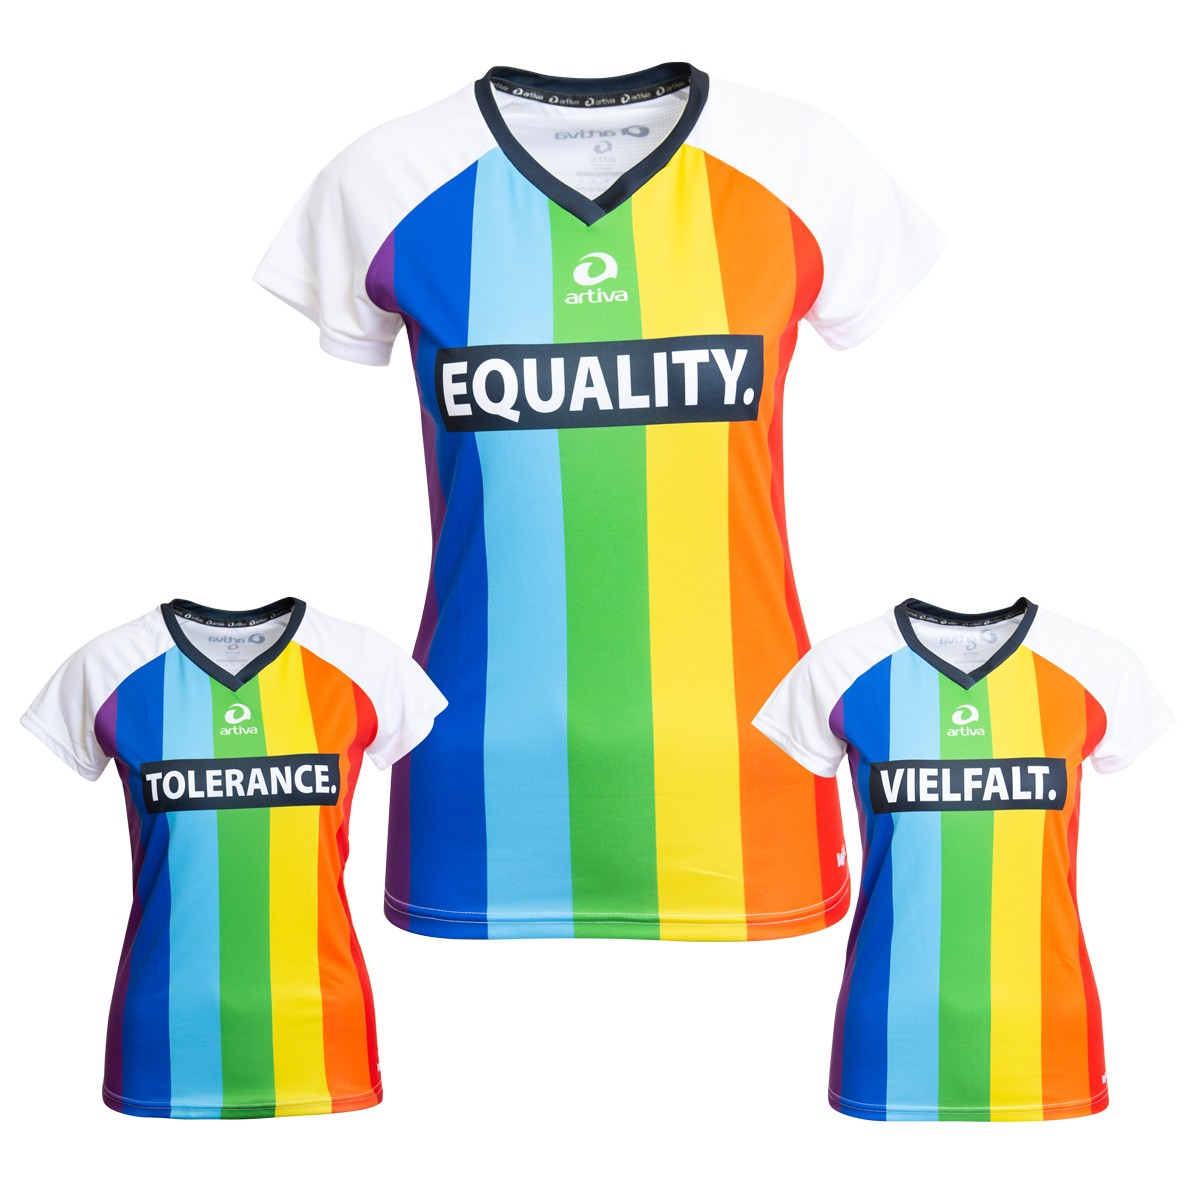 promo code 3f9ea 04f67 Laufshirt bedrucken? Nur bei Artiva Sports!